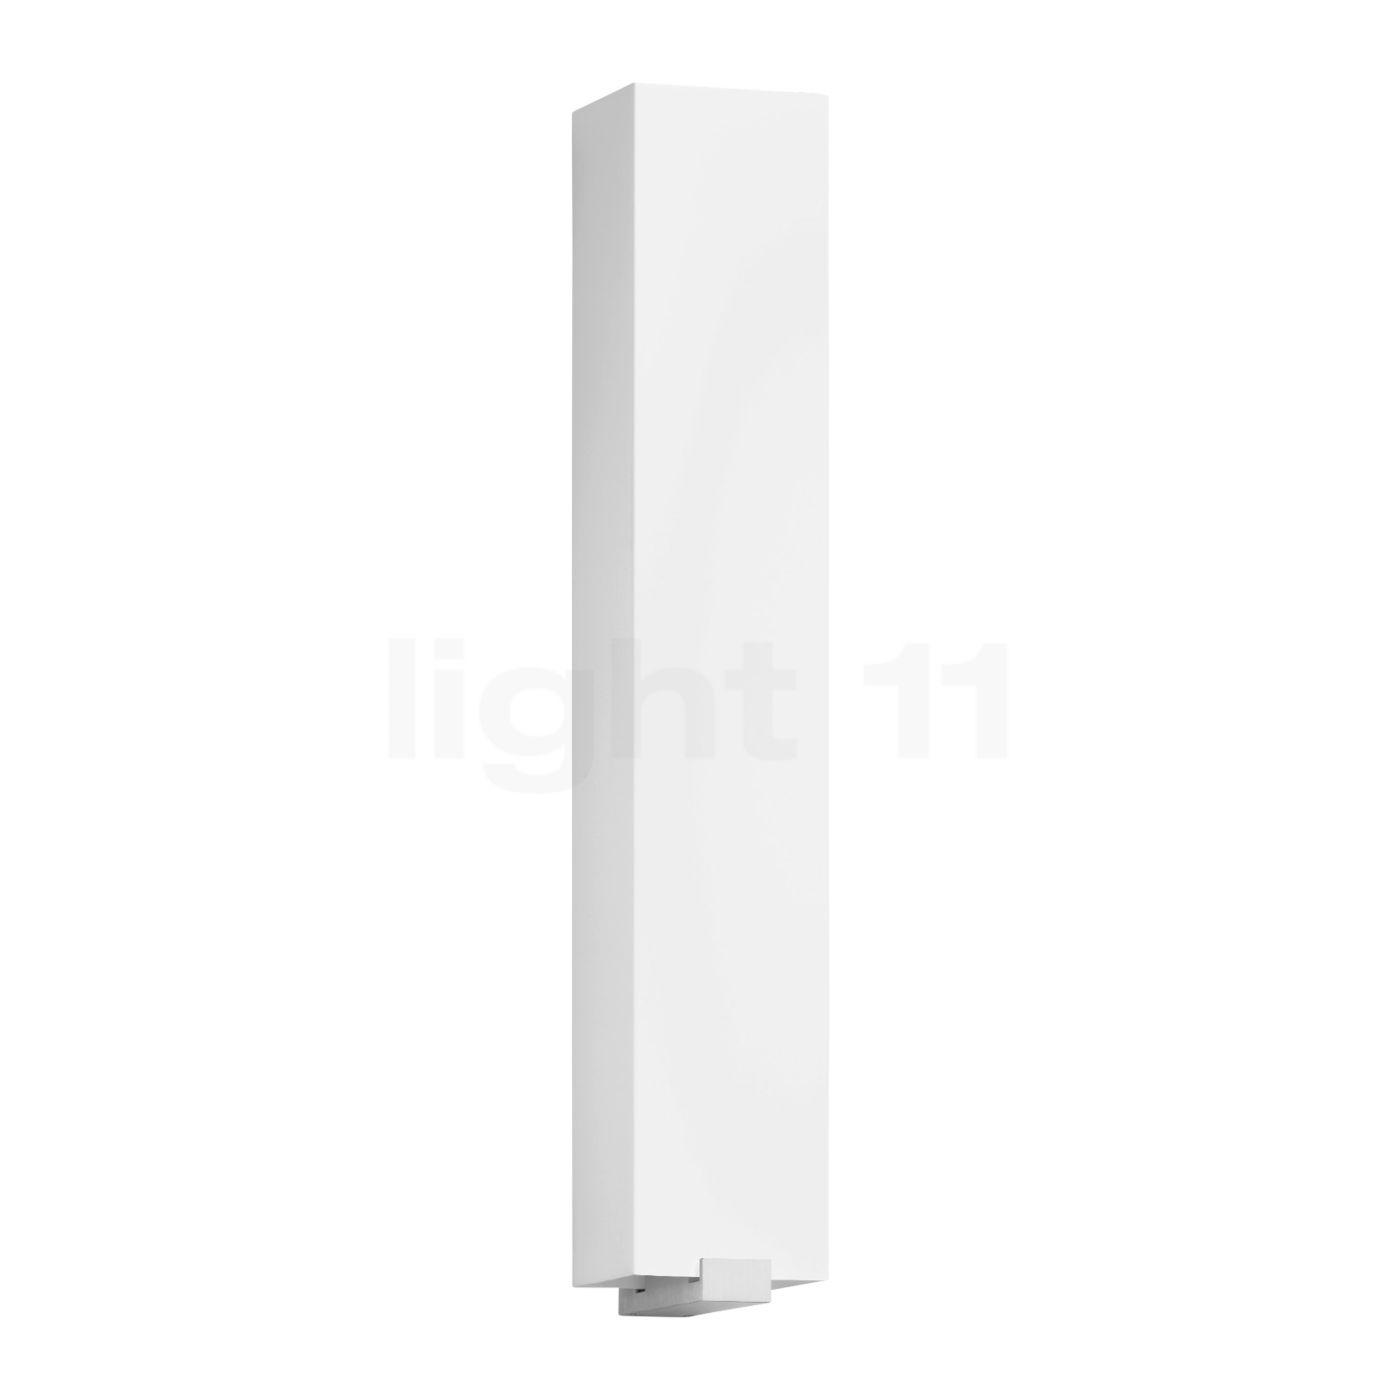 Bega 50140 - Wandleuchte LED, opalglas 50140.2K3